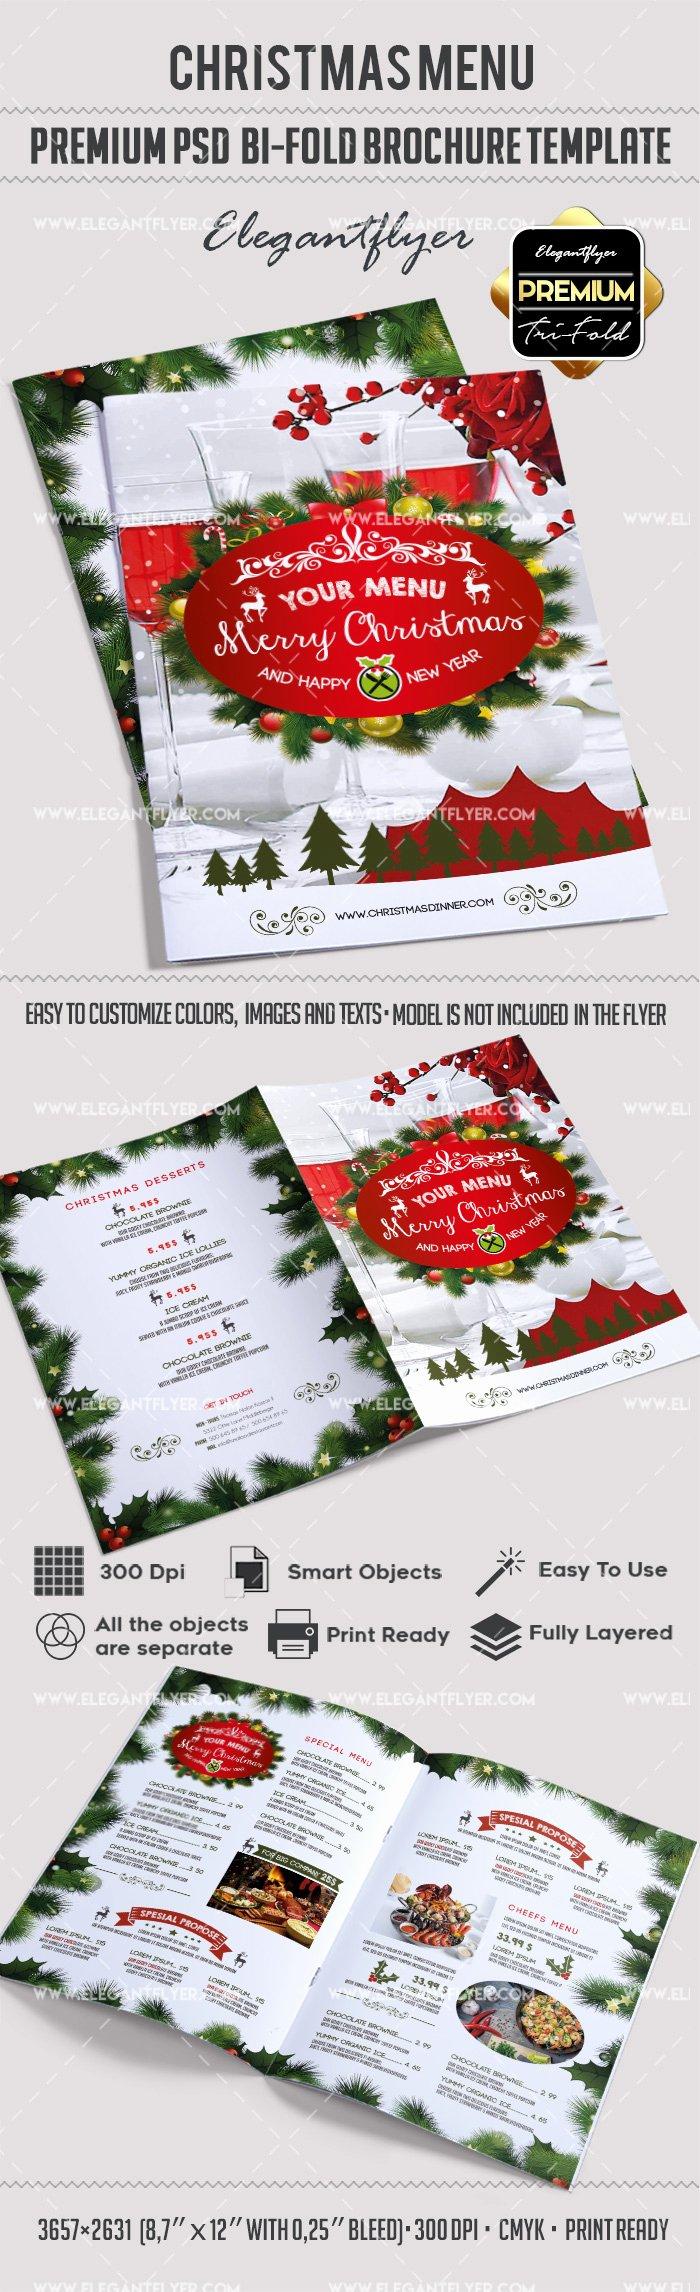 Bi Fold Menu Template Awesome Christmas Menu Bi Fold Brochure – by Elegantflyer